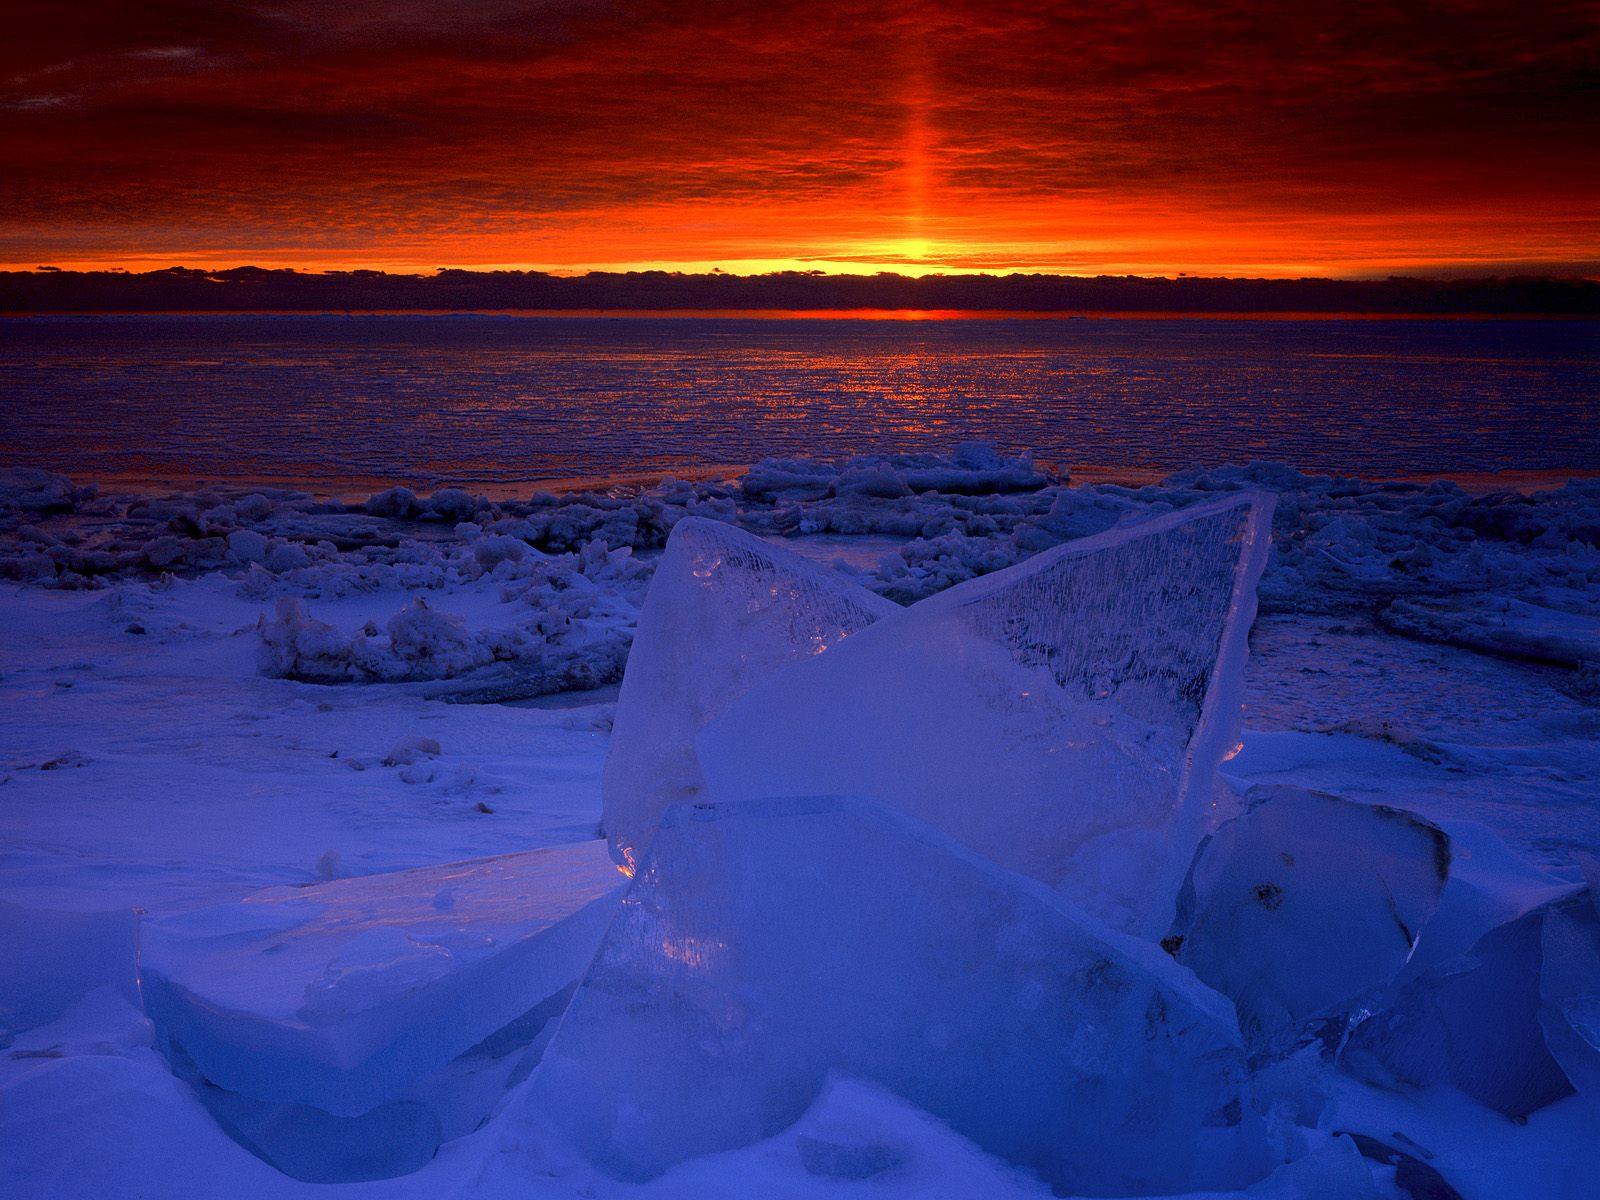 Sunrise Light on the Frozen Shores of Newport Bay, Lake Michigan, Wisconsin